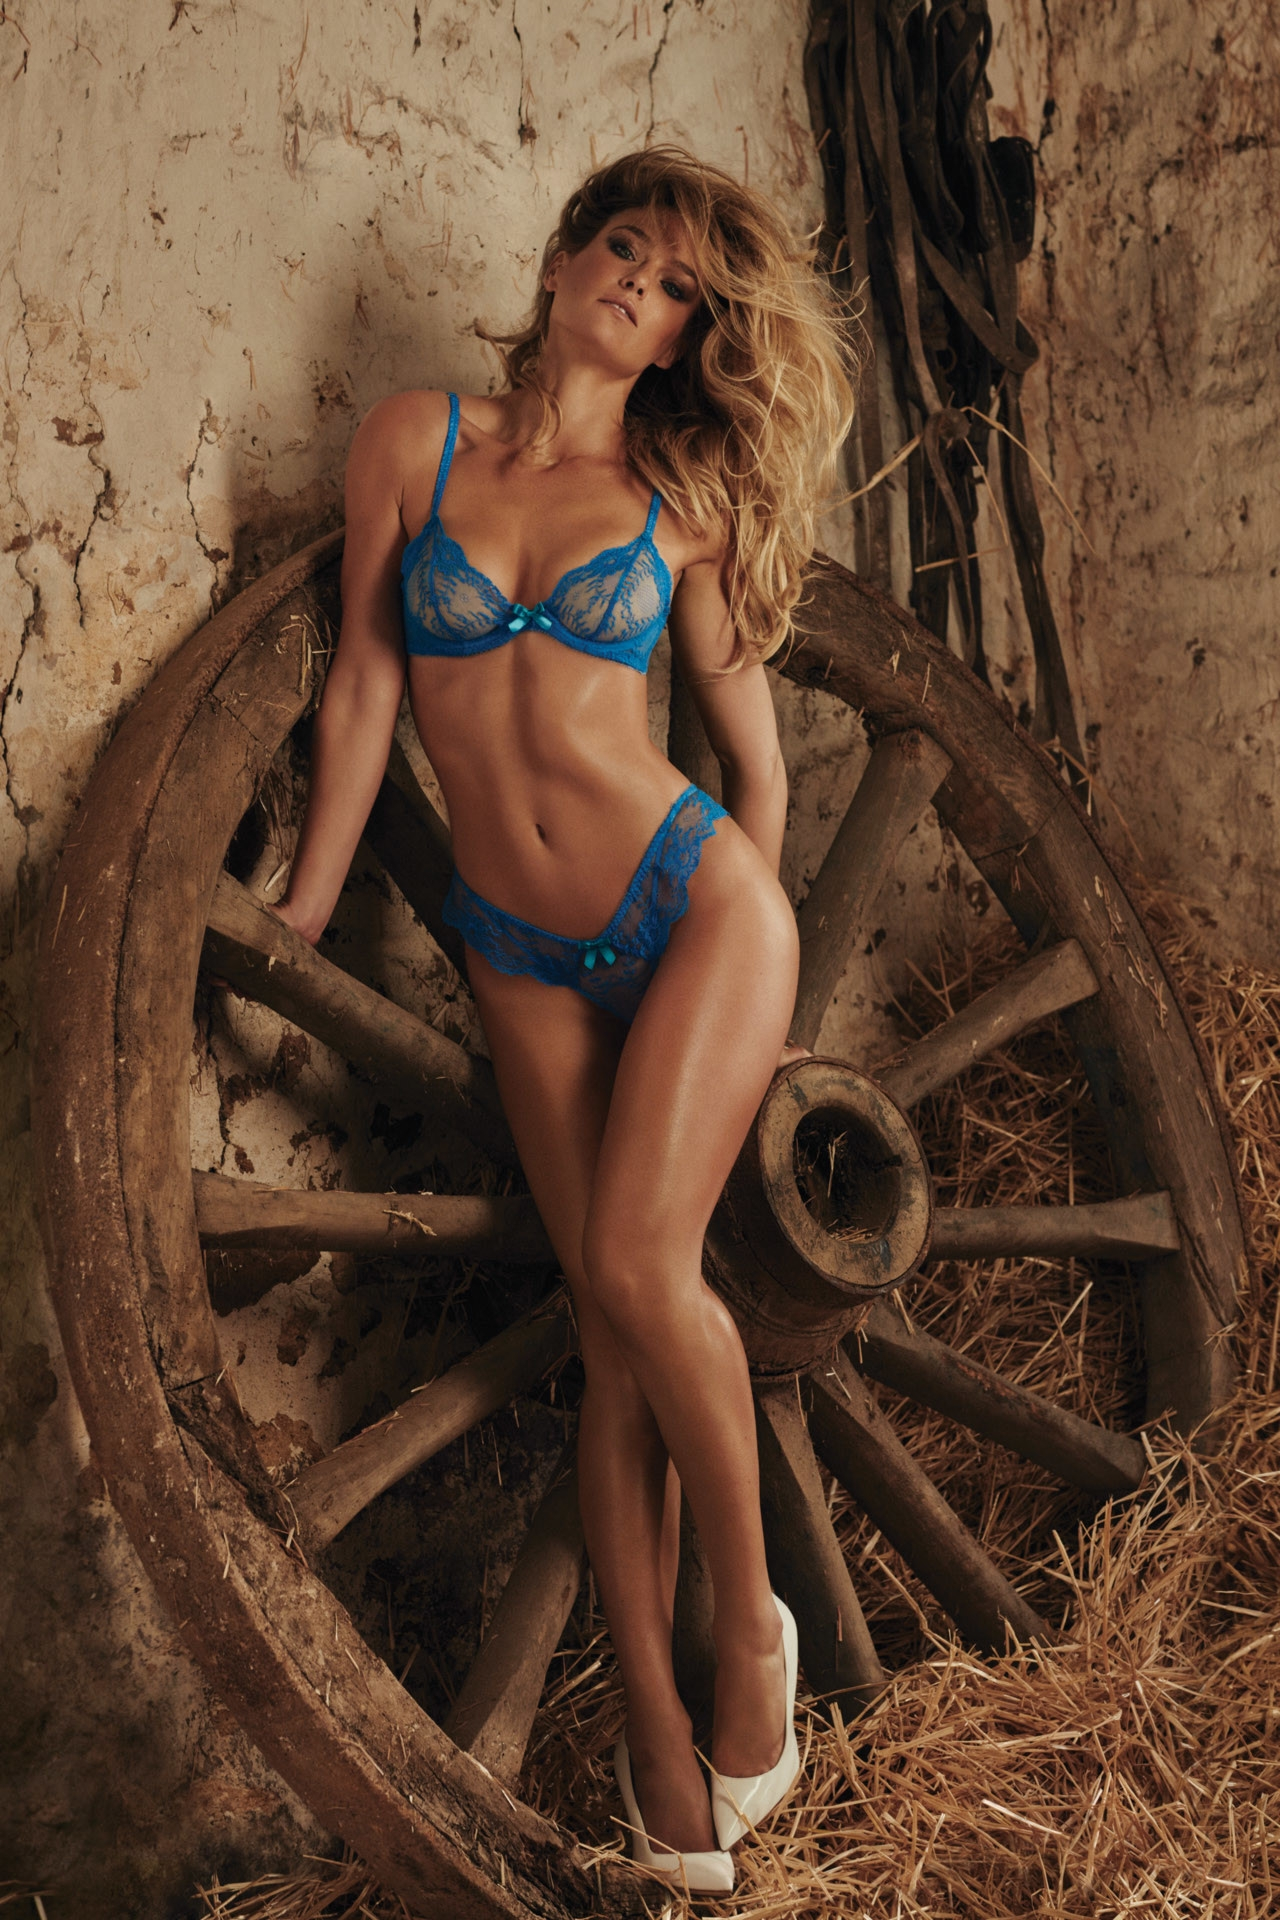 Beauty model bikini mobile wallpaper